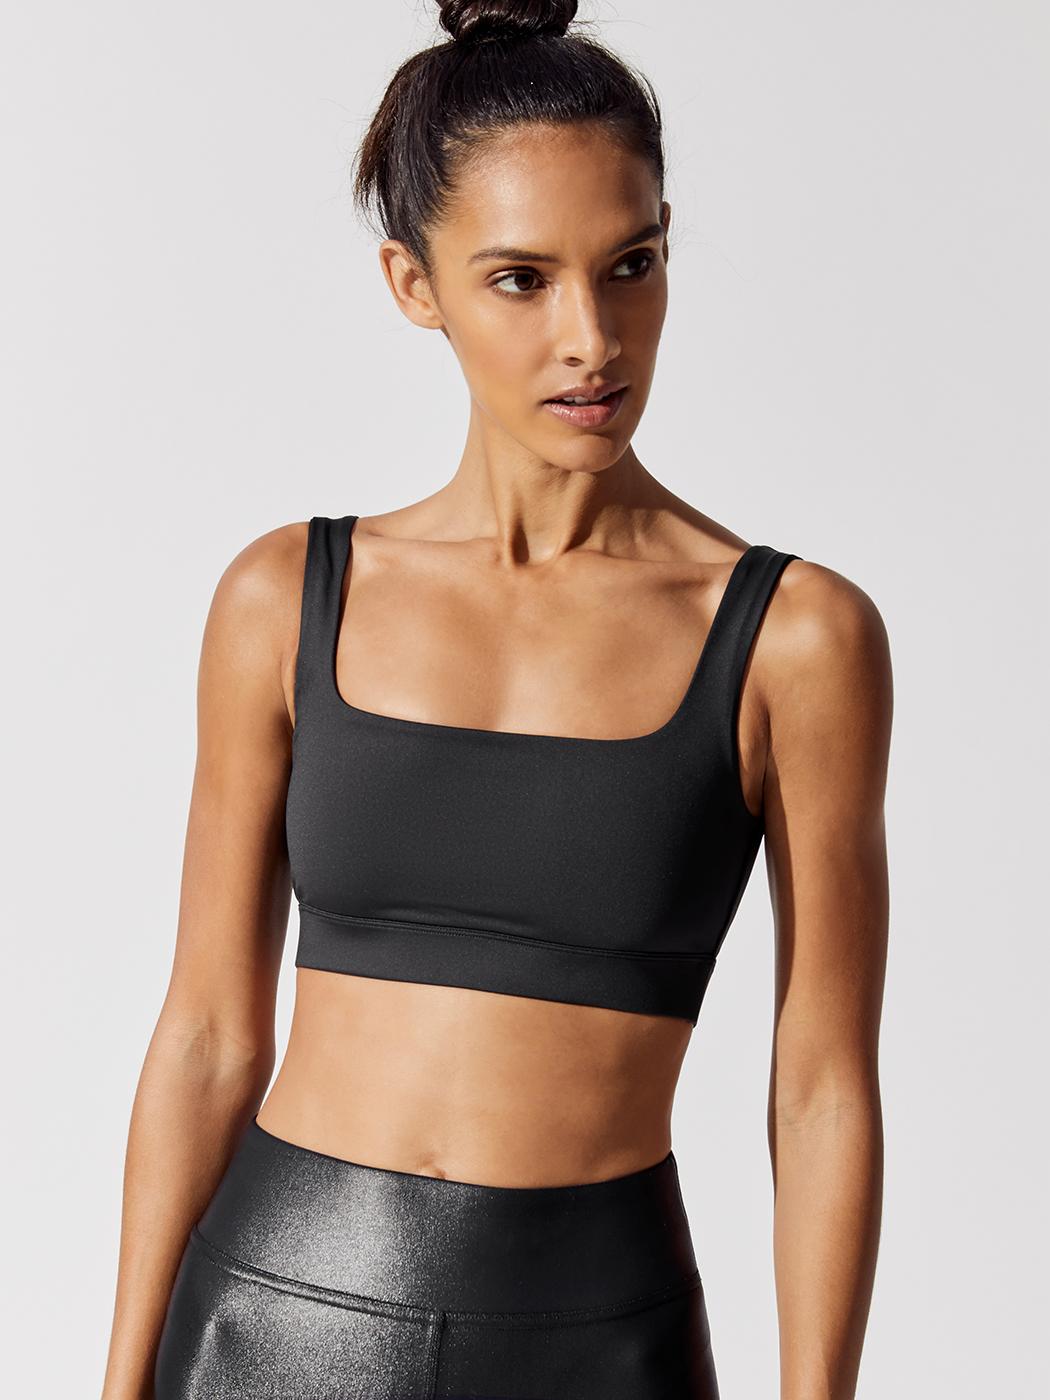 03939df81c44d Carbon38 BASKET WEAVE X-BACK BRA - Black - Fashion Activewear Running -  Black